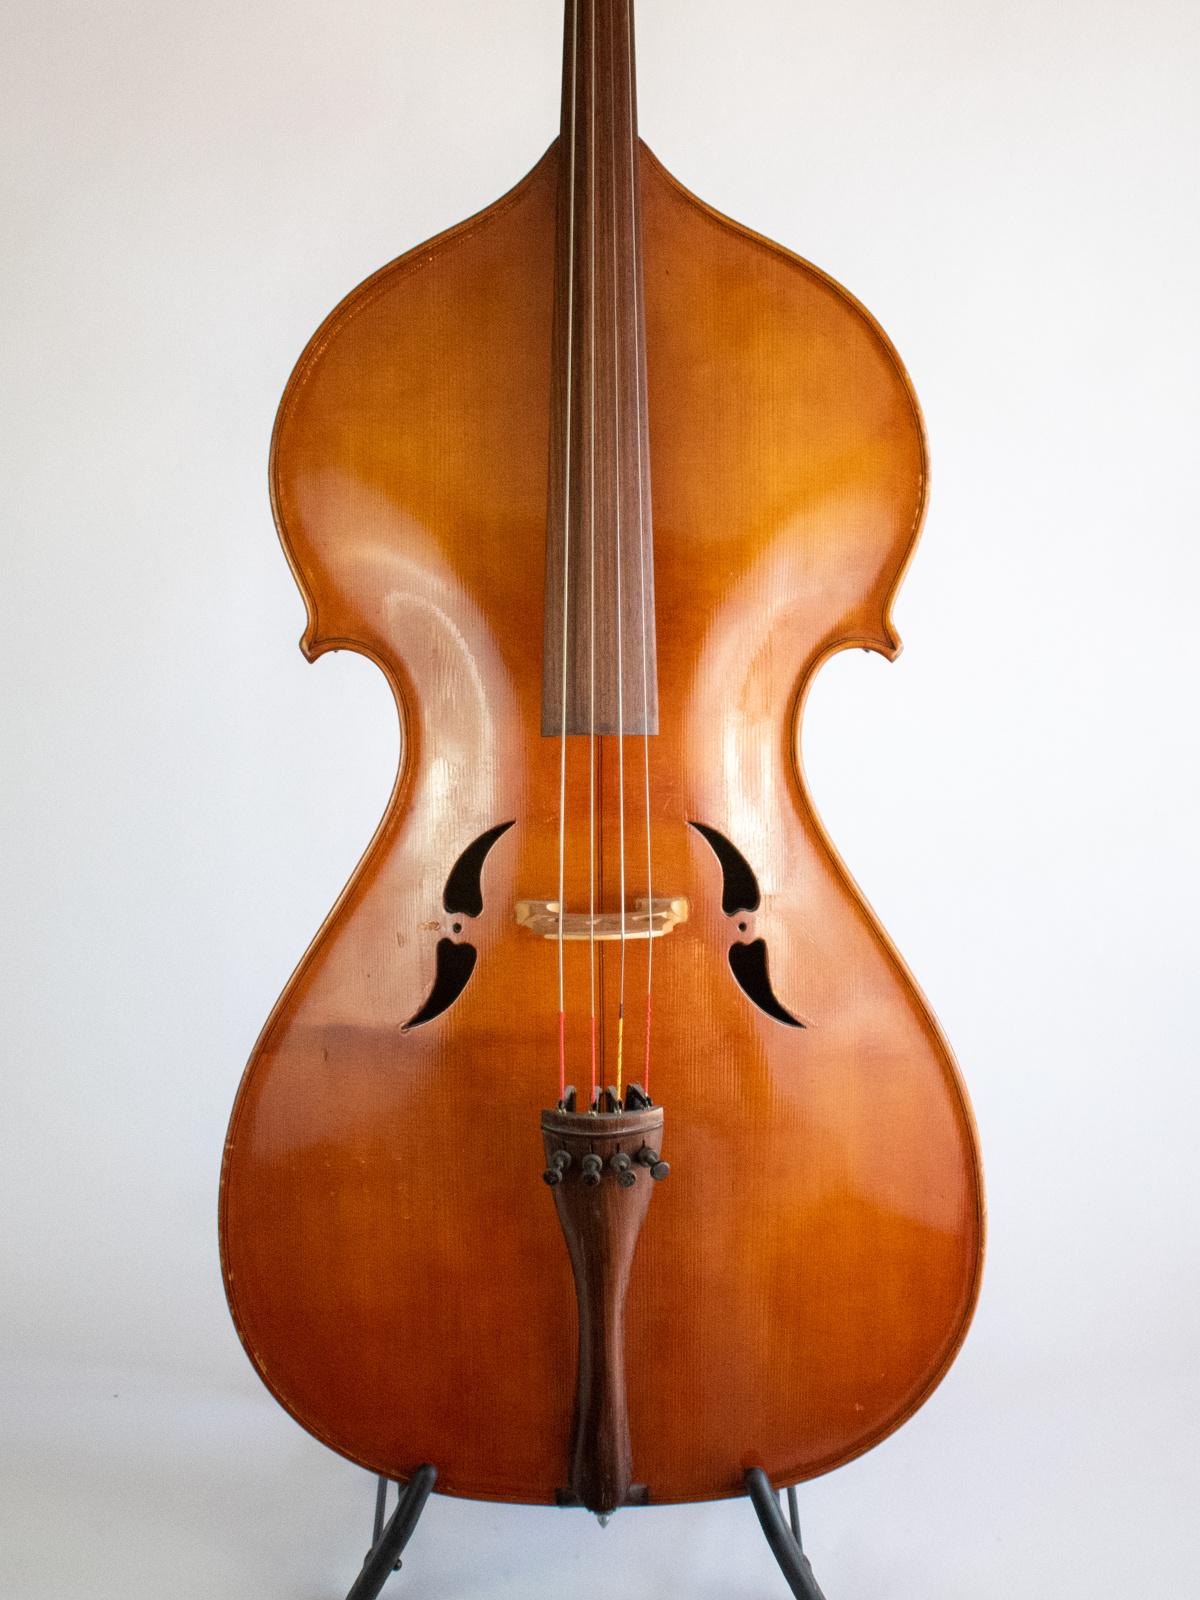 John Uglow cello with horse-head, 1934 Dallas, Oregon